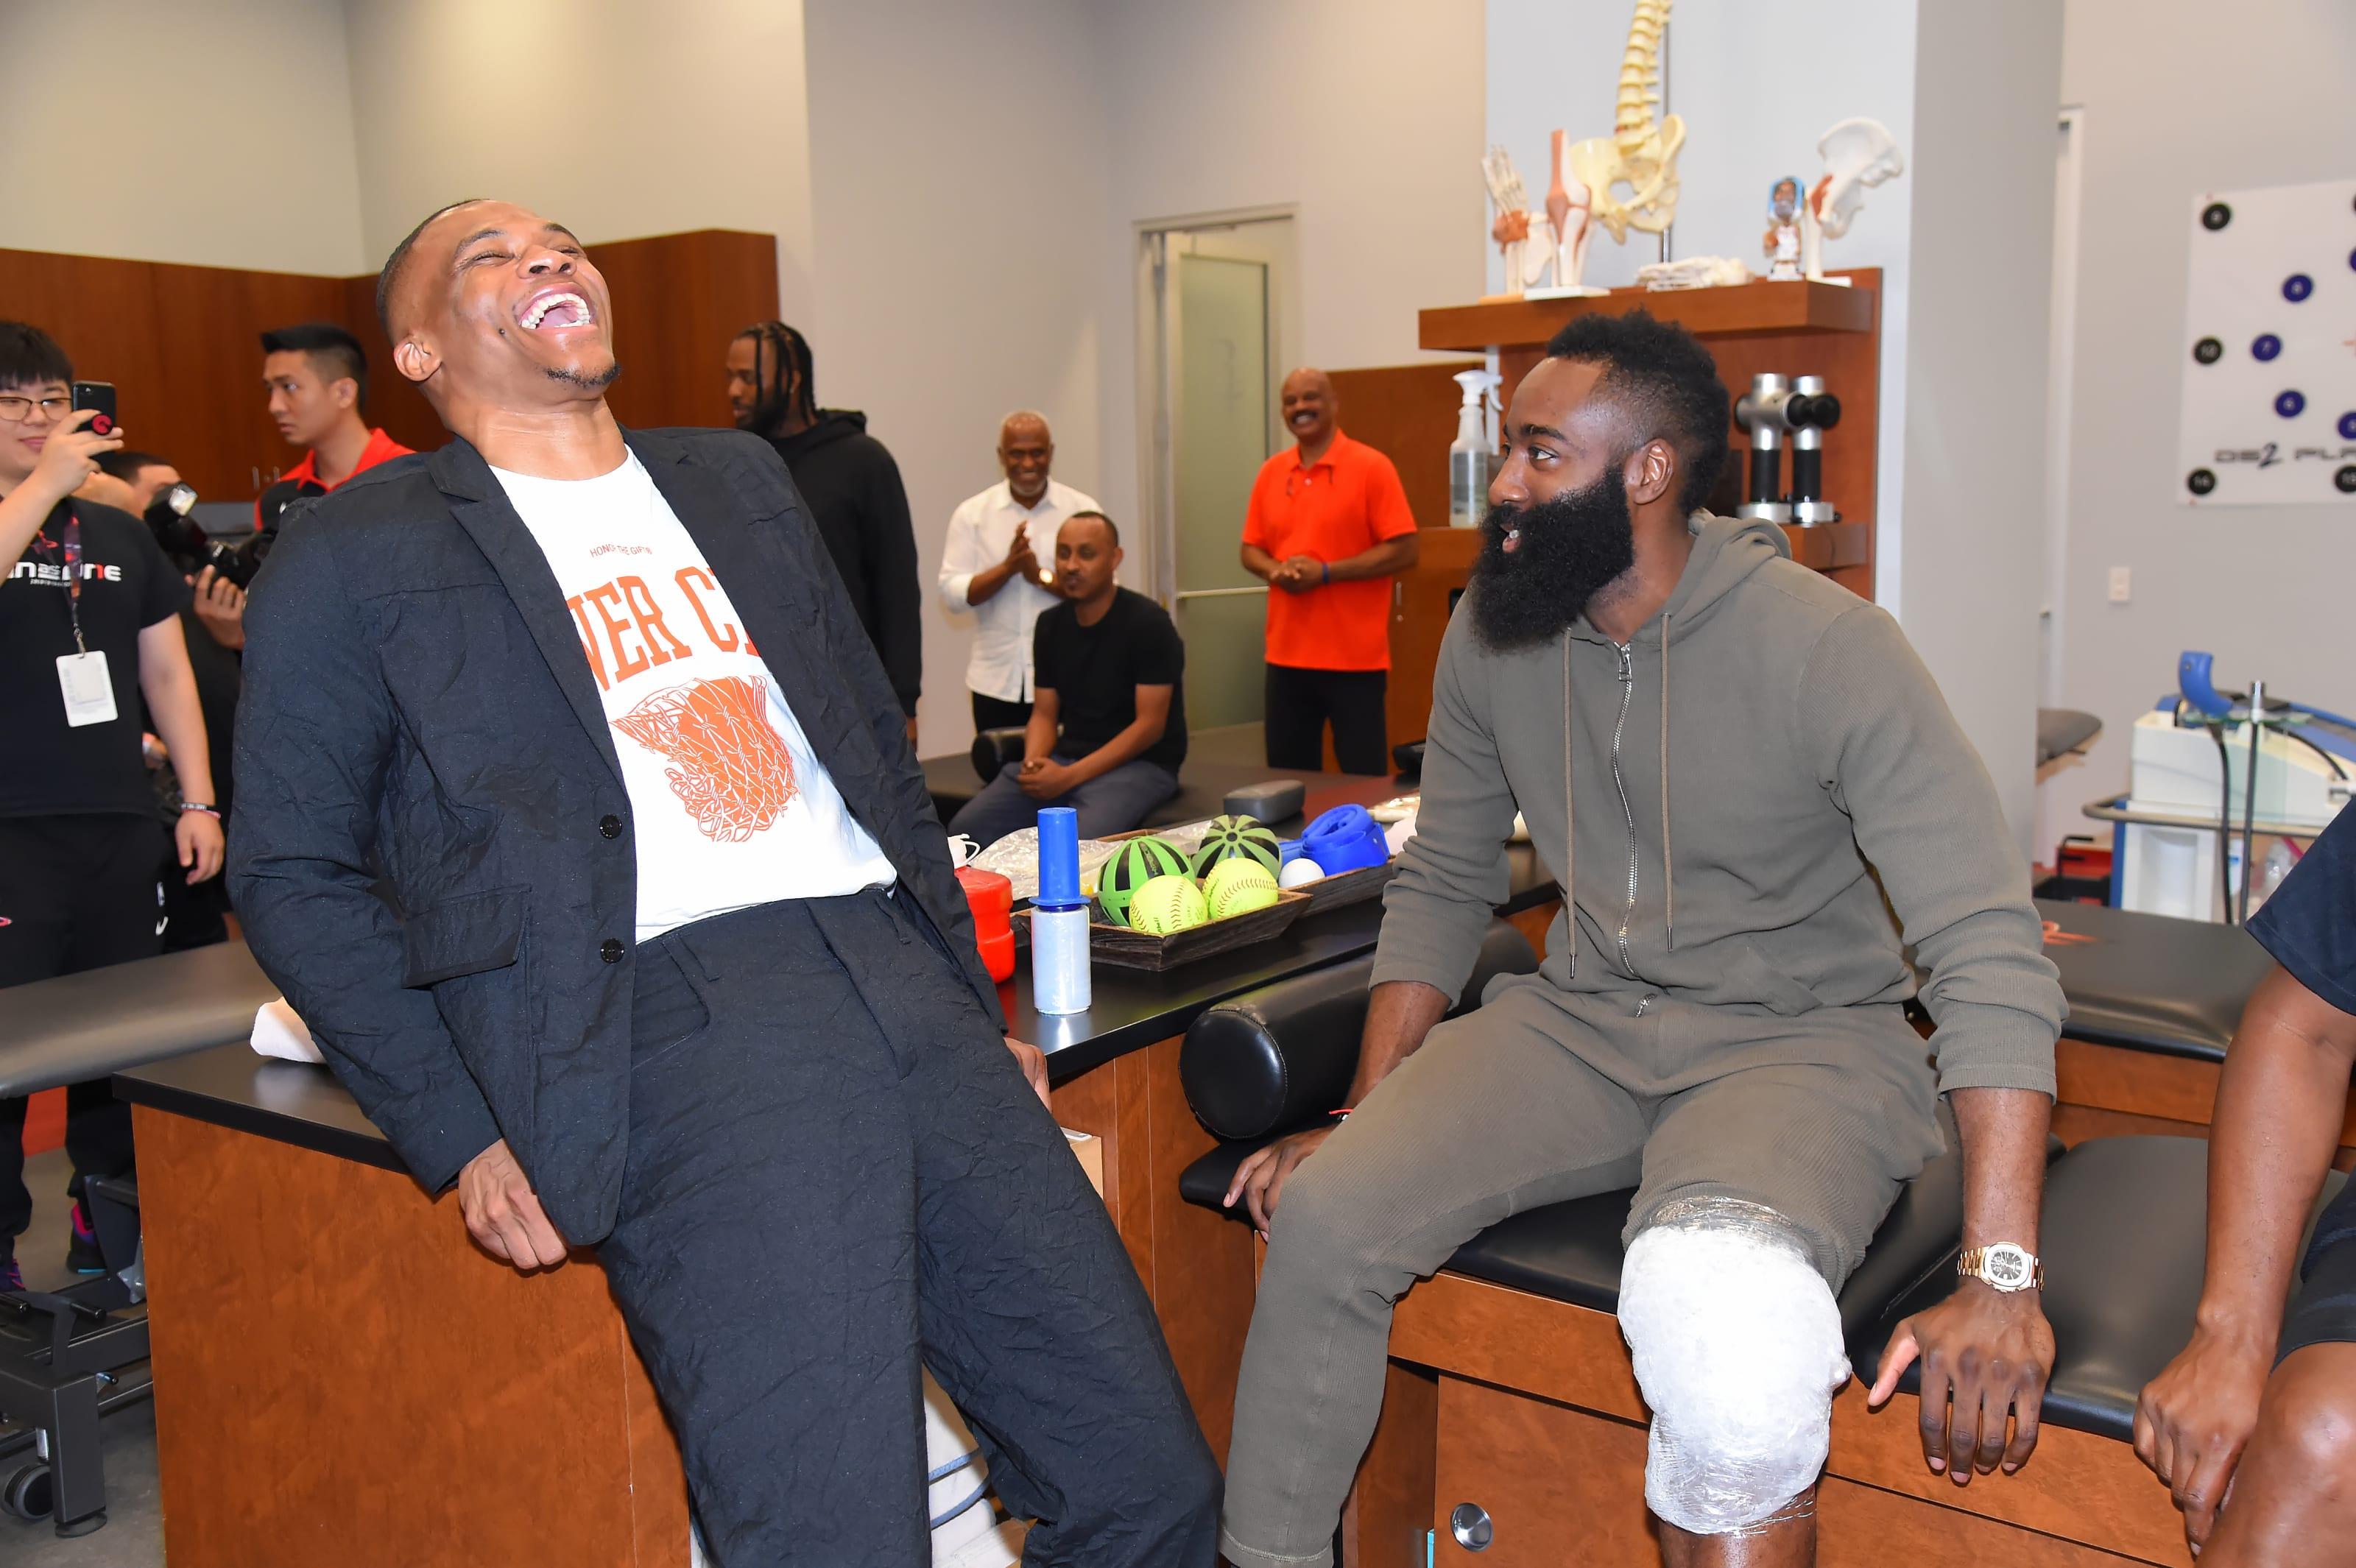 Russell Westbrook #0 of the Houston Rockets talks with James Harden #13 of the Houston Rockets